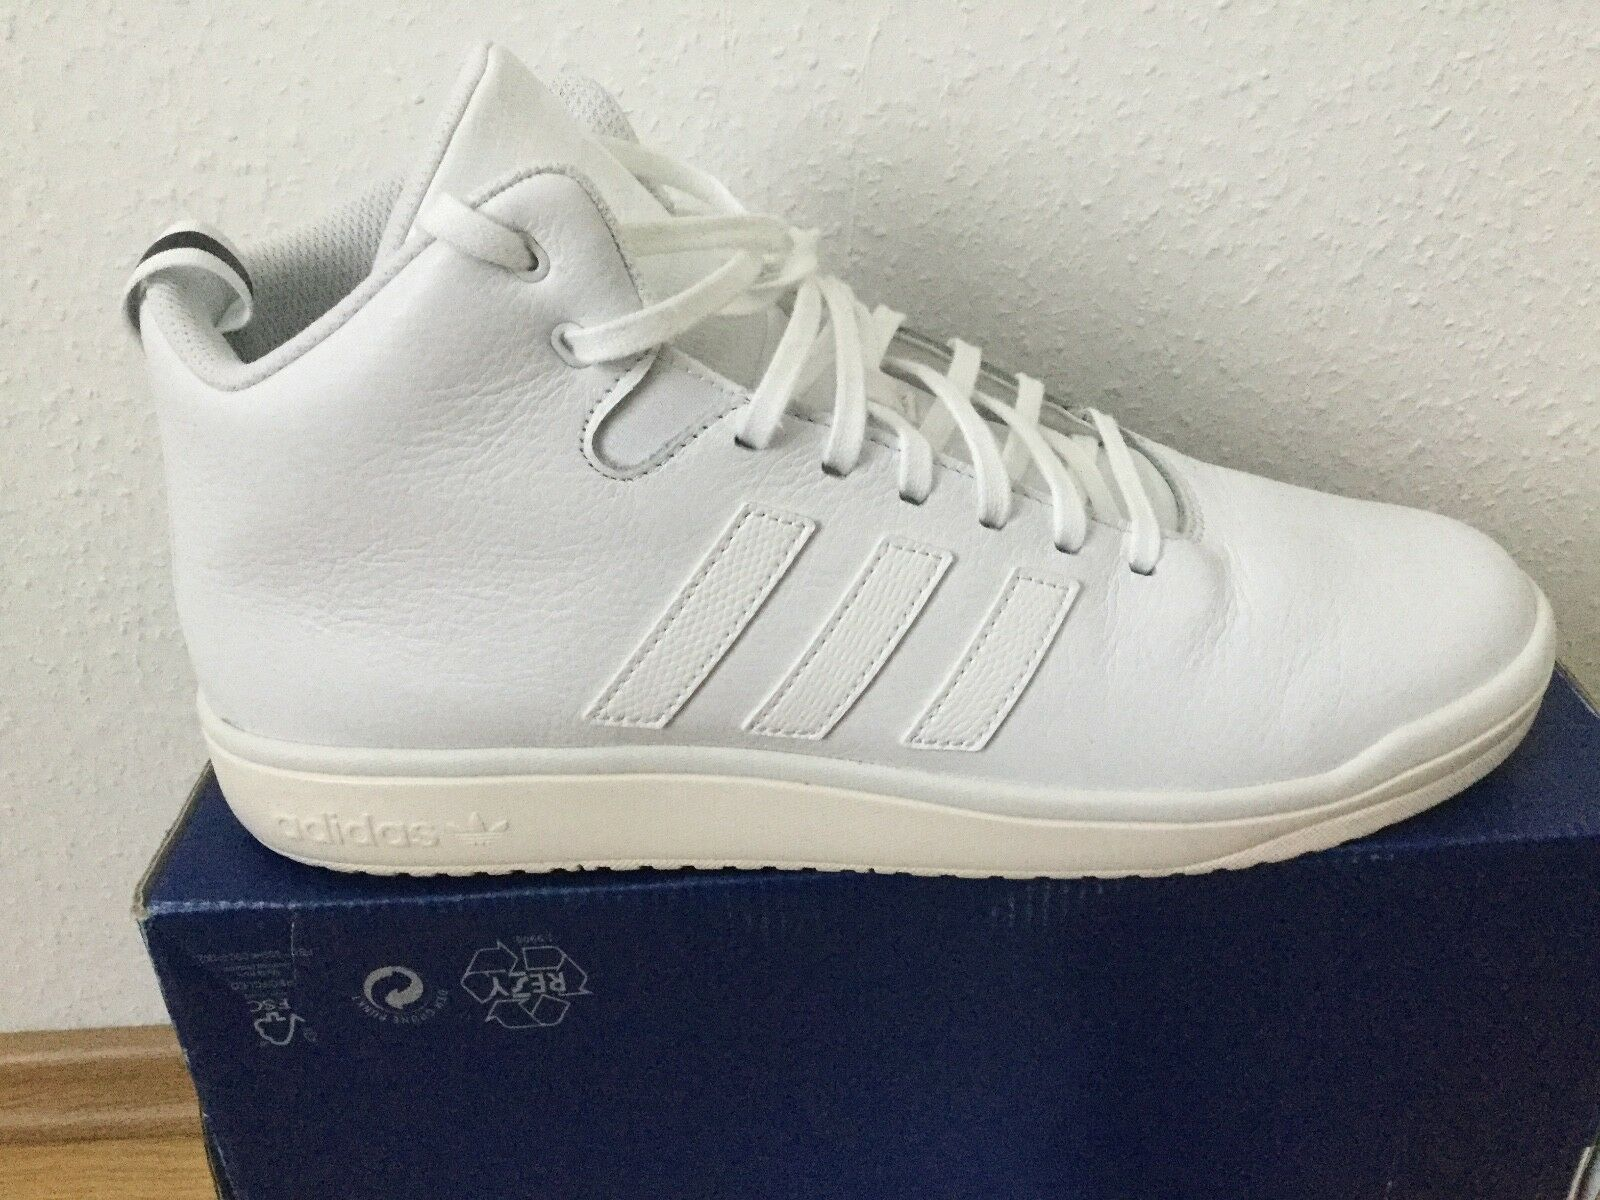 adidas Originals  Schuhe Echtleder-Sneaker  Weiß Herren  Gr.46